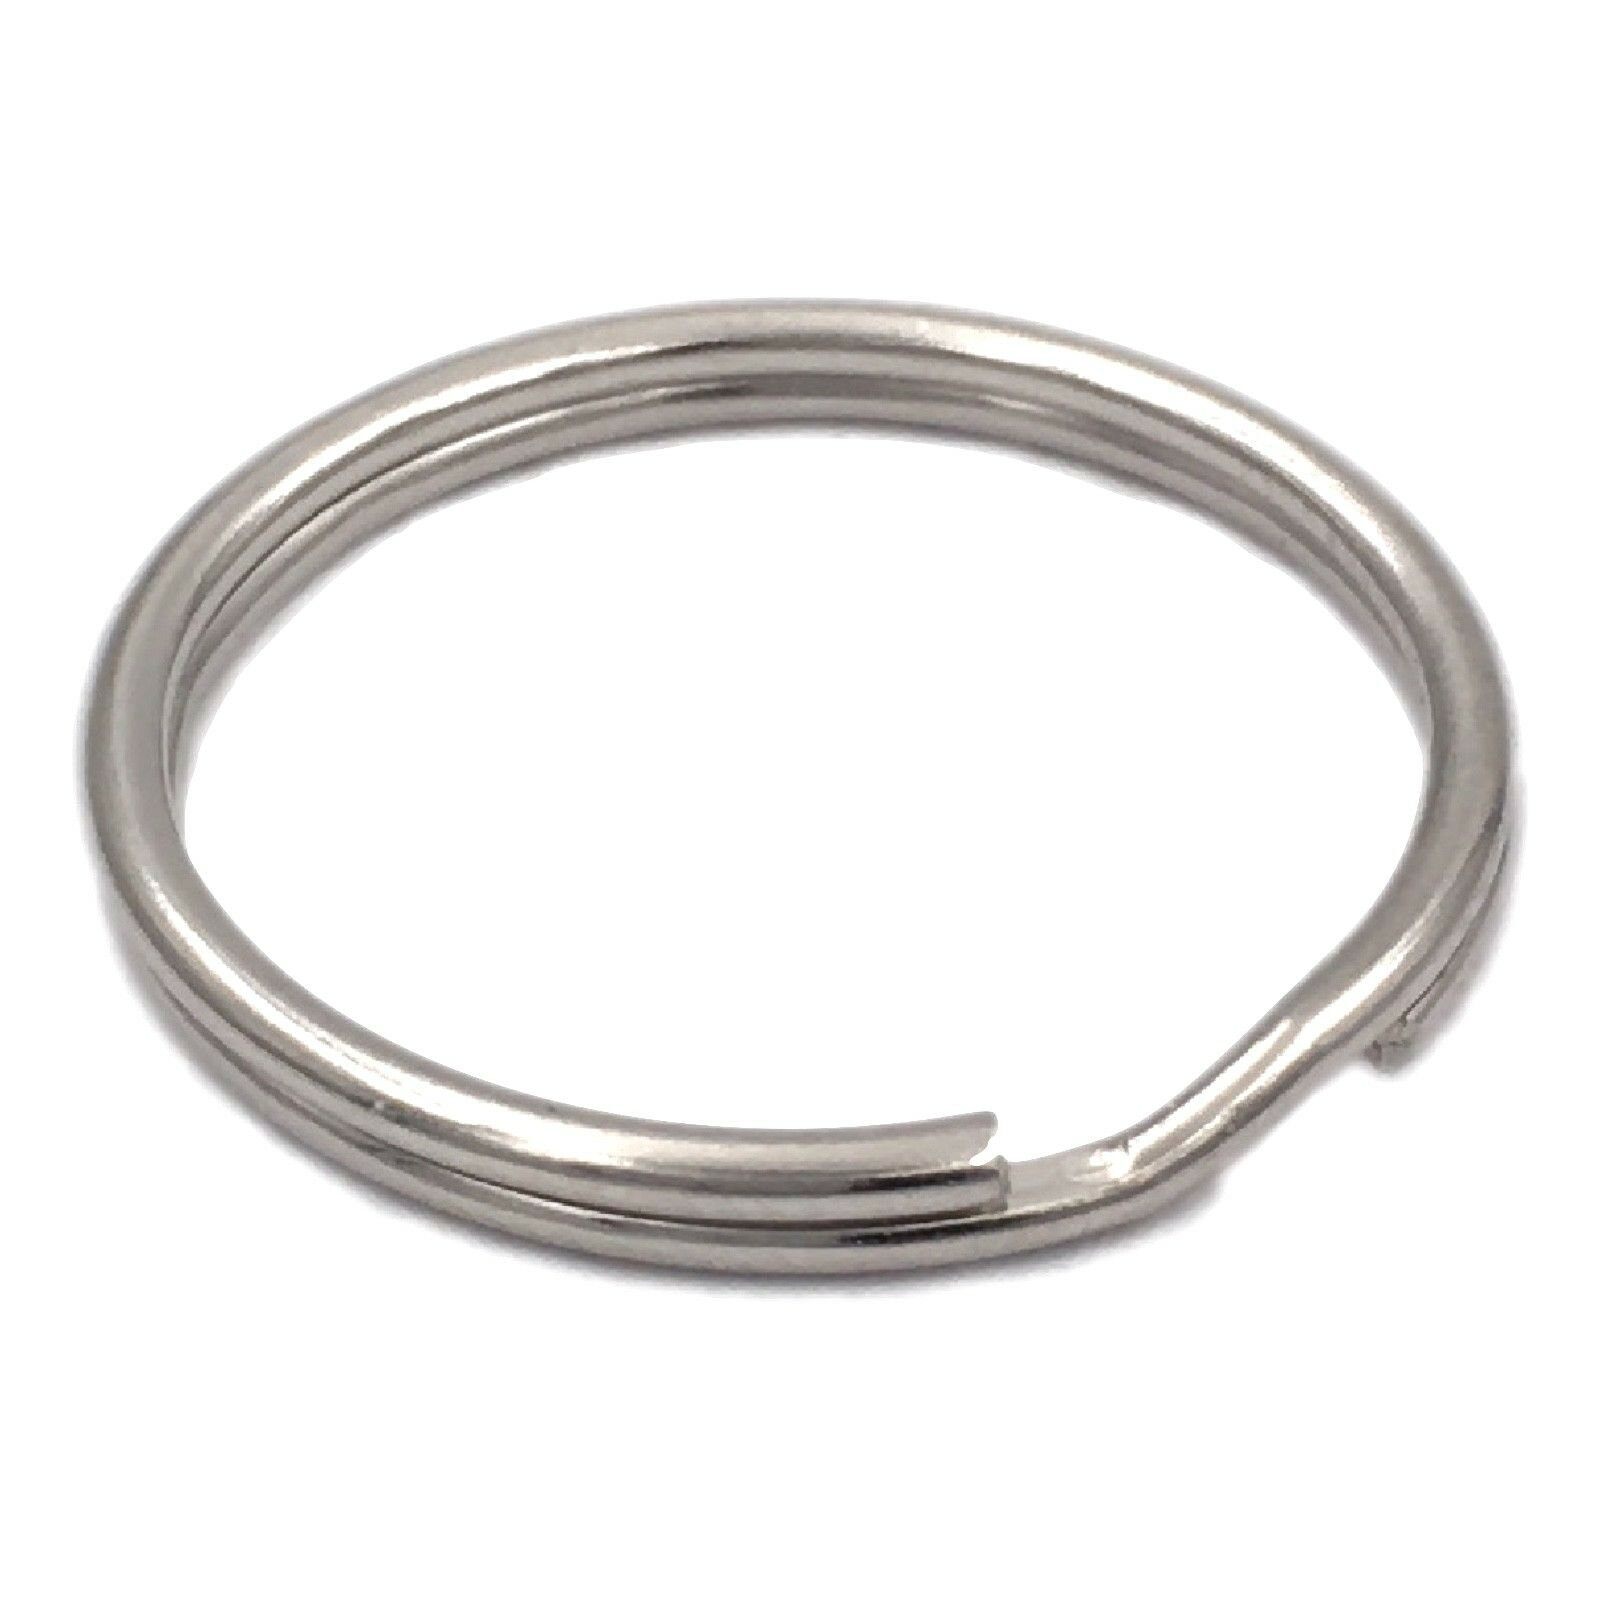 Schlüsselringe 10-50 mm Schlüsselring Stahl glänzend Edelstahl NEU Ring